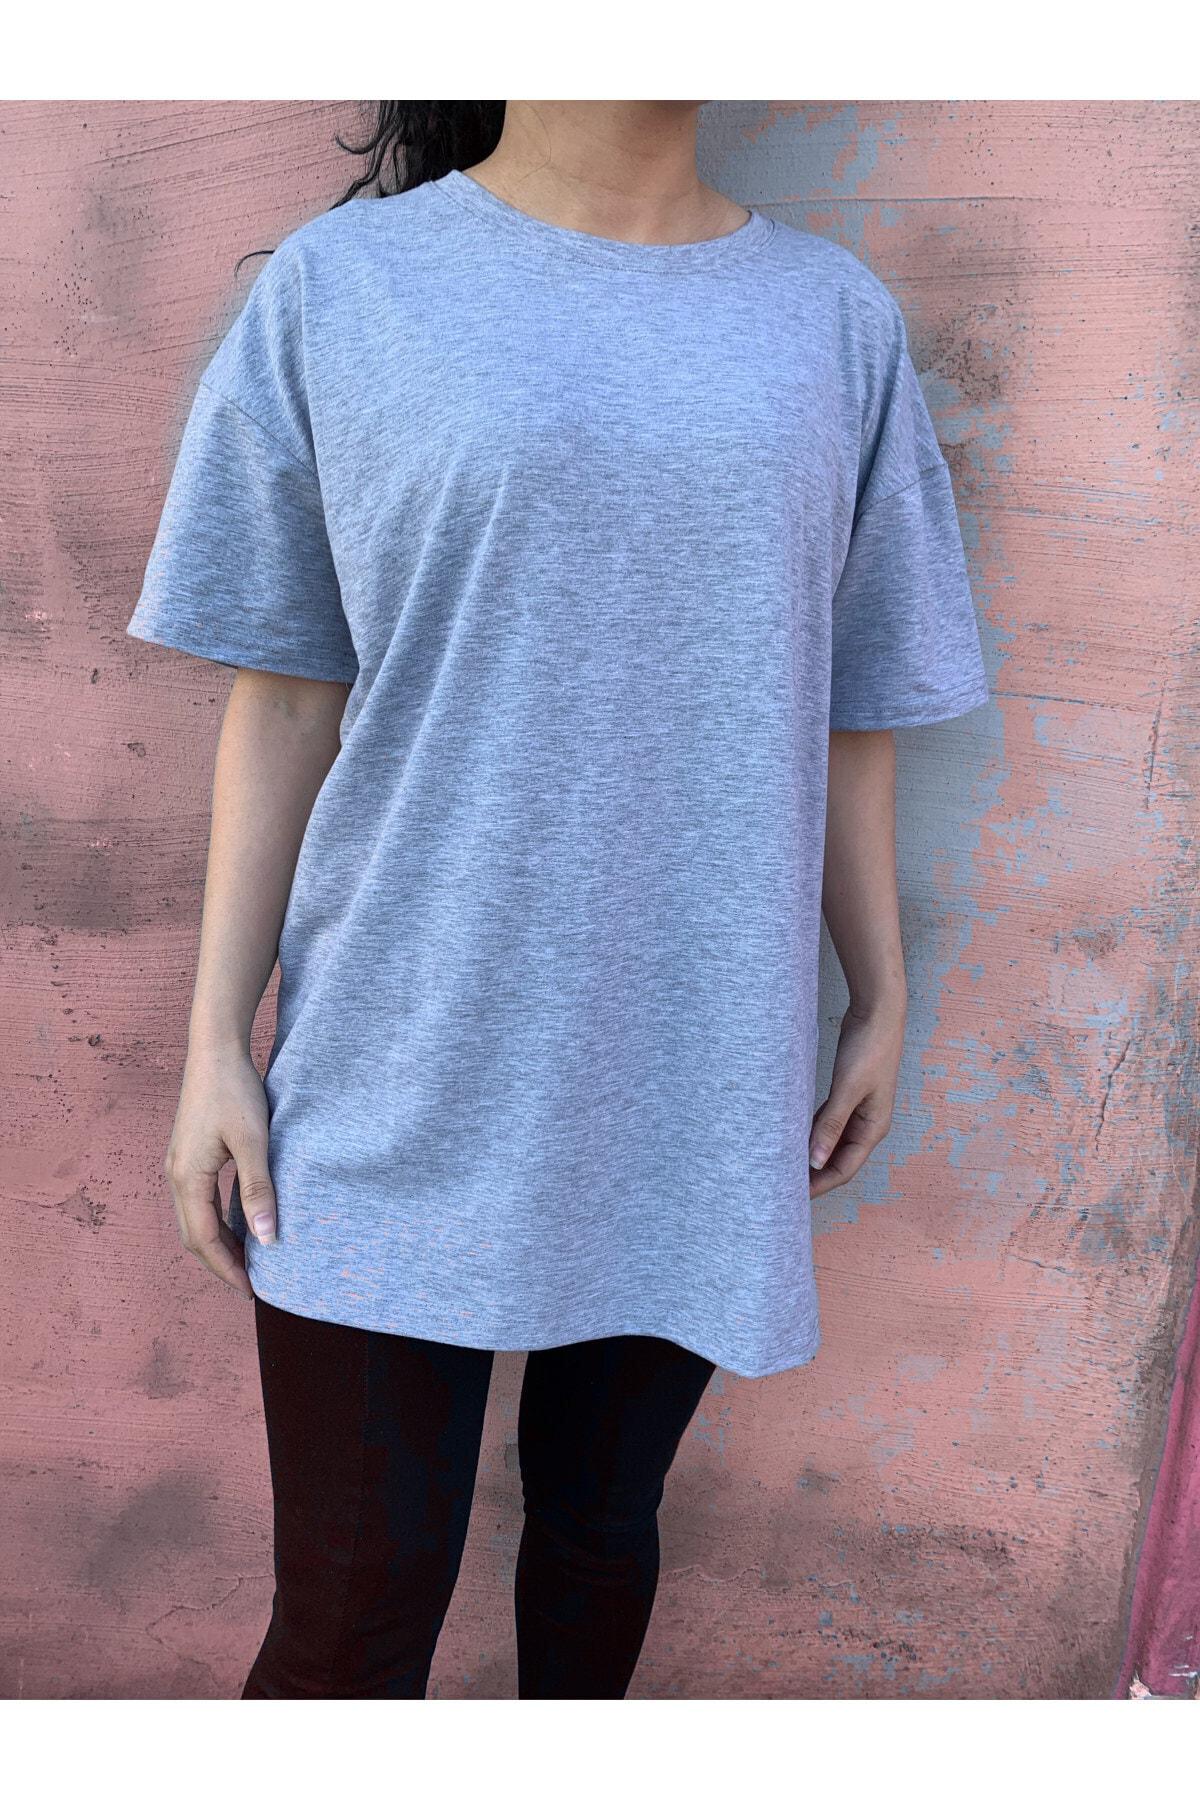 Kadın Gri %100 Pamuk Bisiklet Yaka Oversize Örme Tshirt